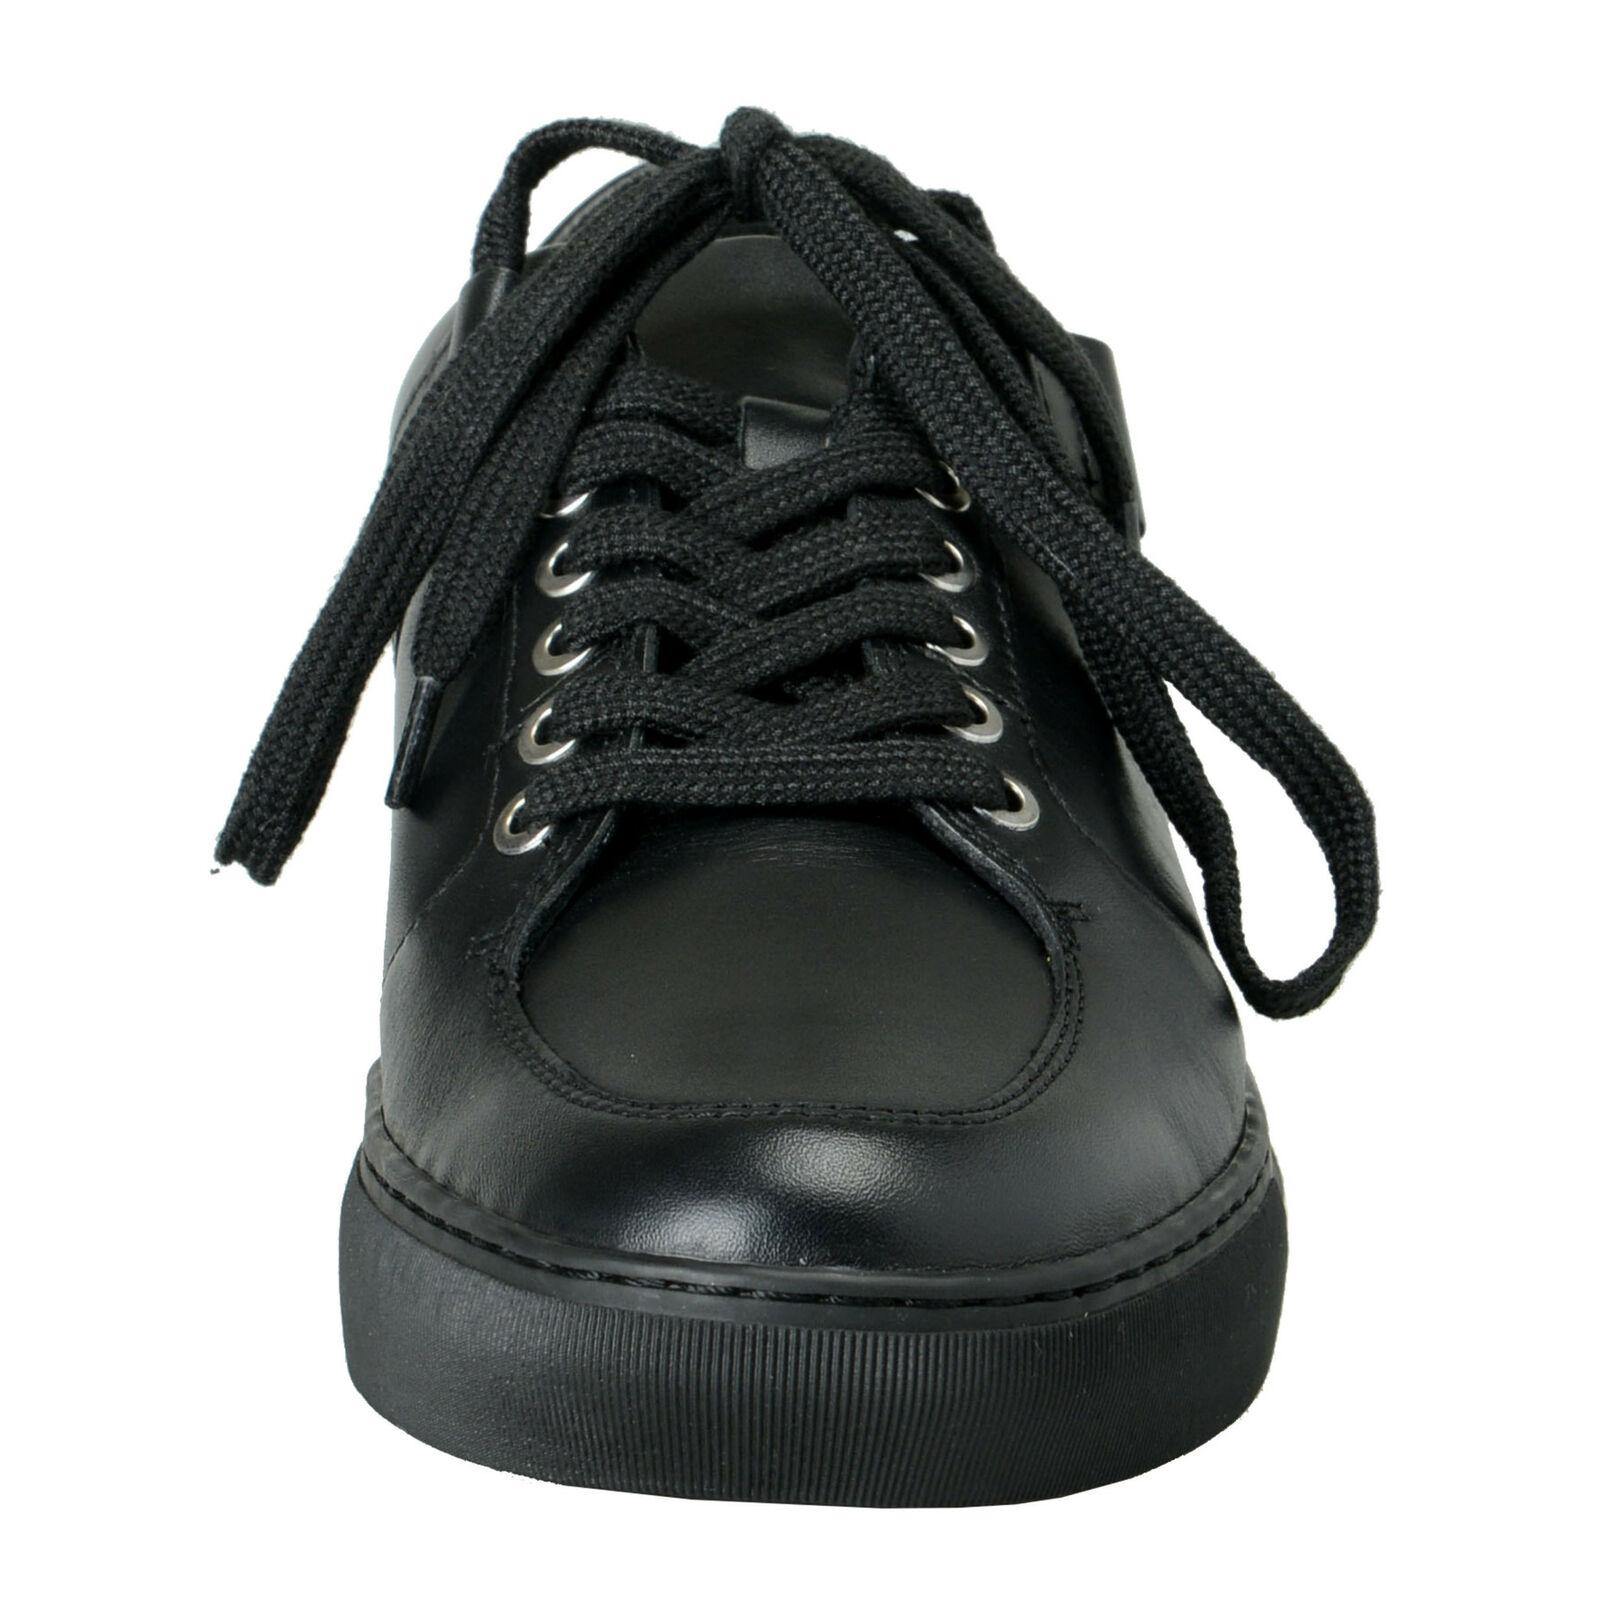 Versace Versace Versace Collection Men's nero Leather Fashion scarpe da ginnastica scarpe 6 7 8 9 10 11 695400